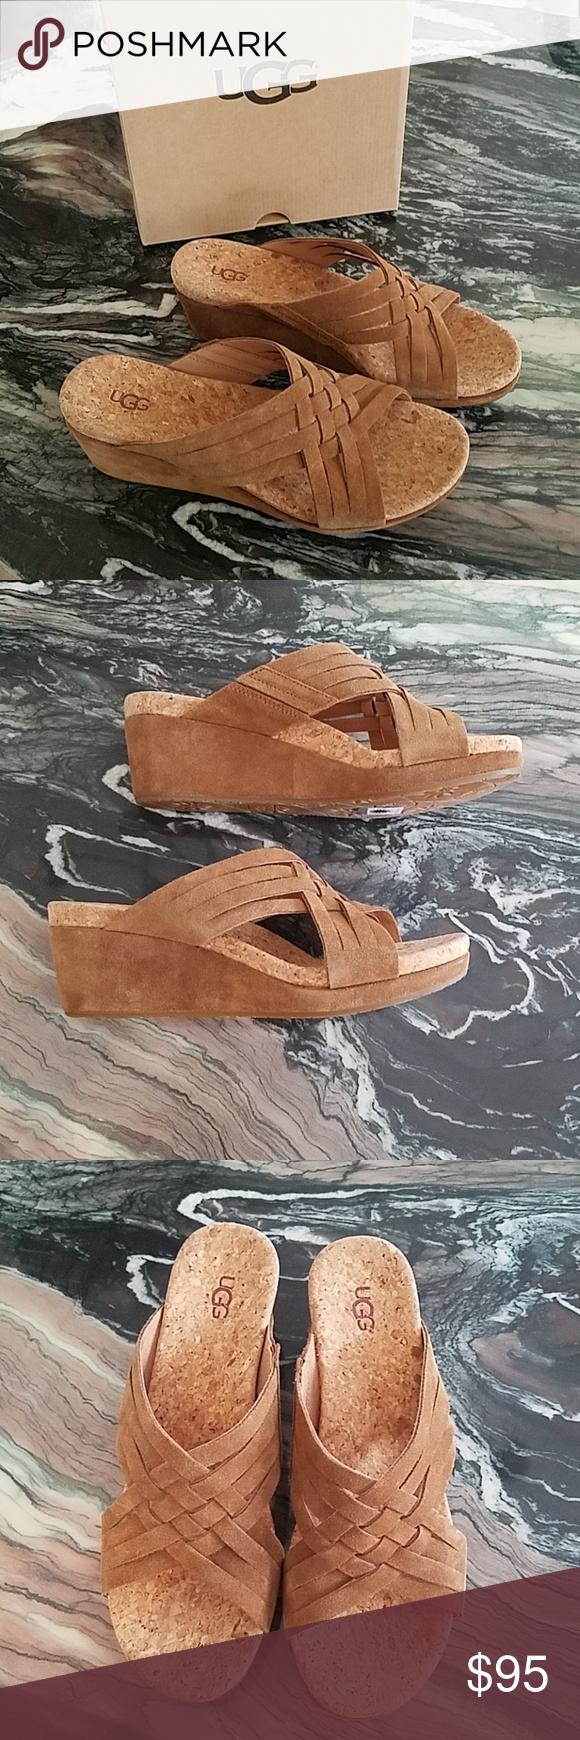 133e9fb5cf UGG Lilah Chestnut Wedge Sandals New in Box! UGG Lilah Chestnut Wedge  Sandals For a